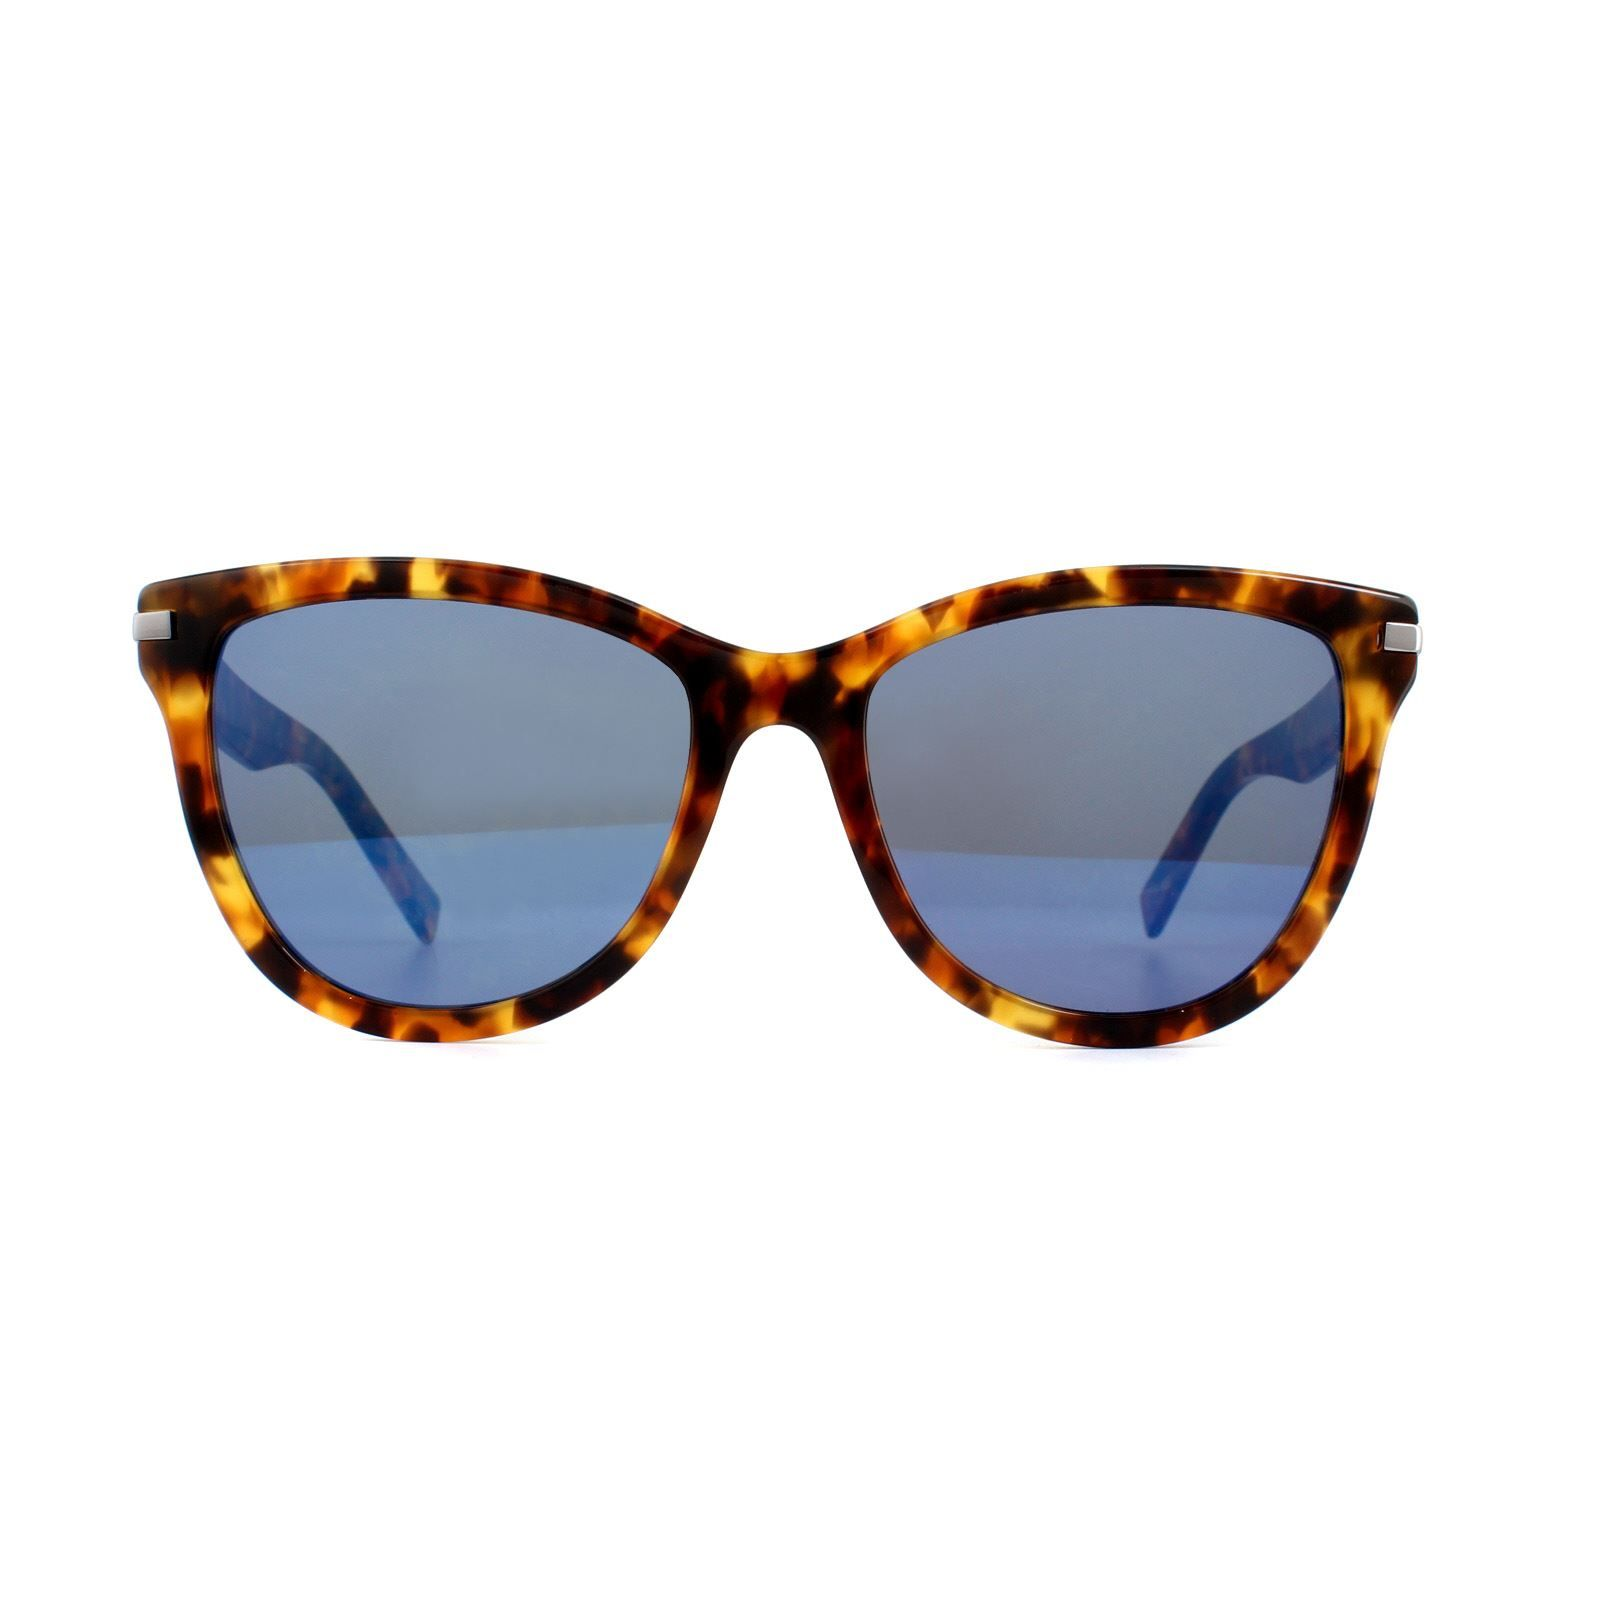 Marc Jacobs Sunglasses MARC 187/S C9B XT Havana Honey Blue Mirrored